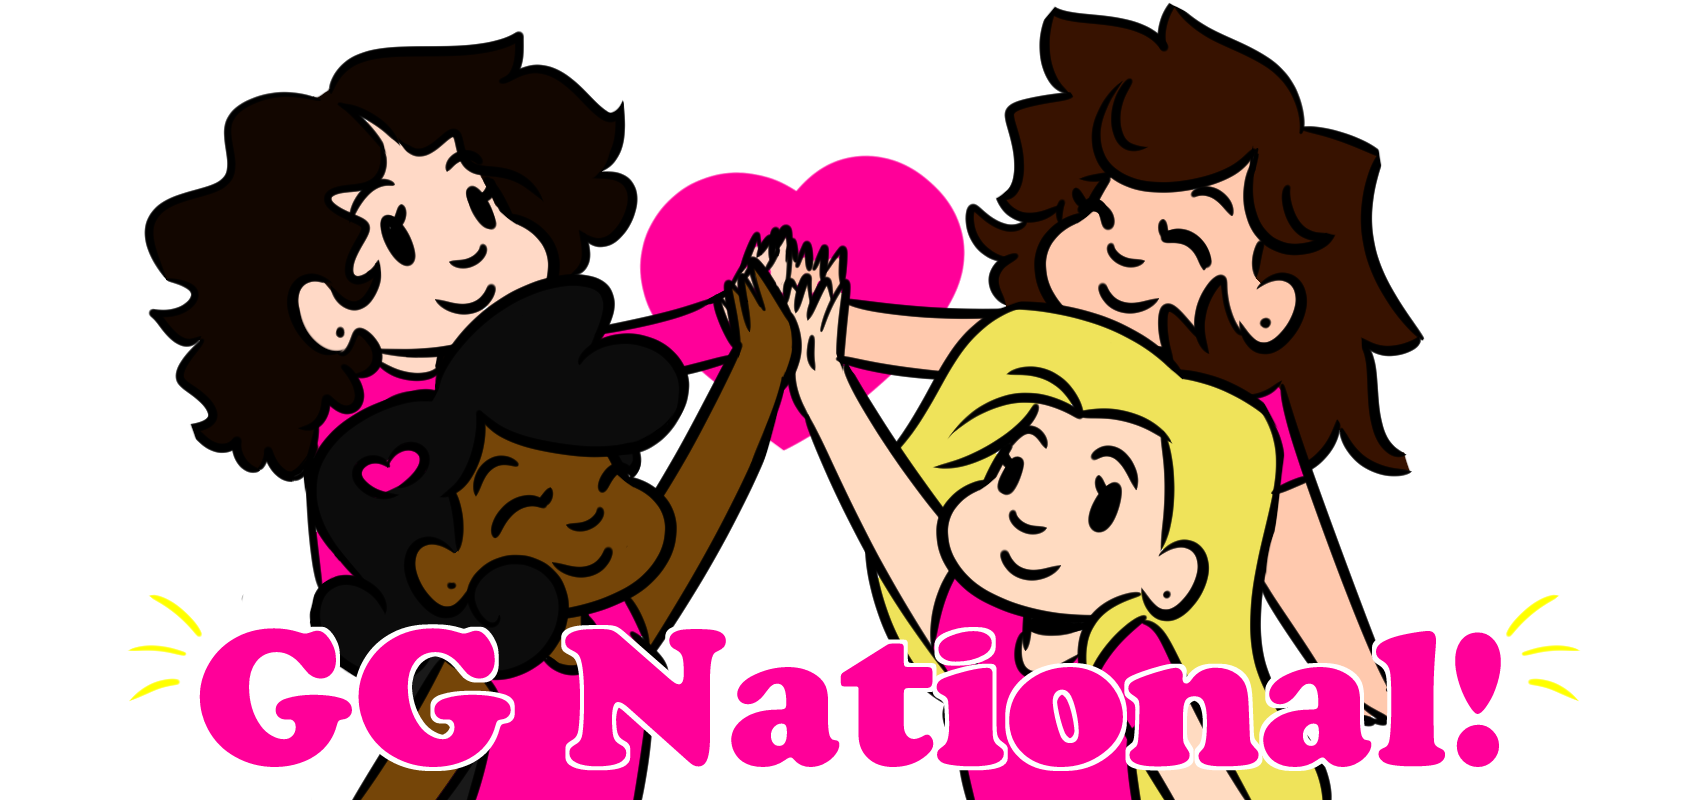 Ask Sam GG national yay.png